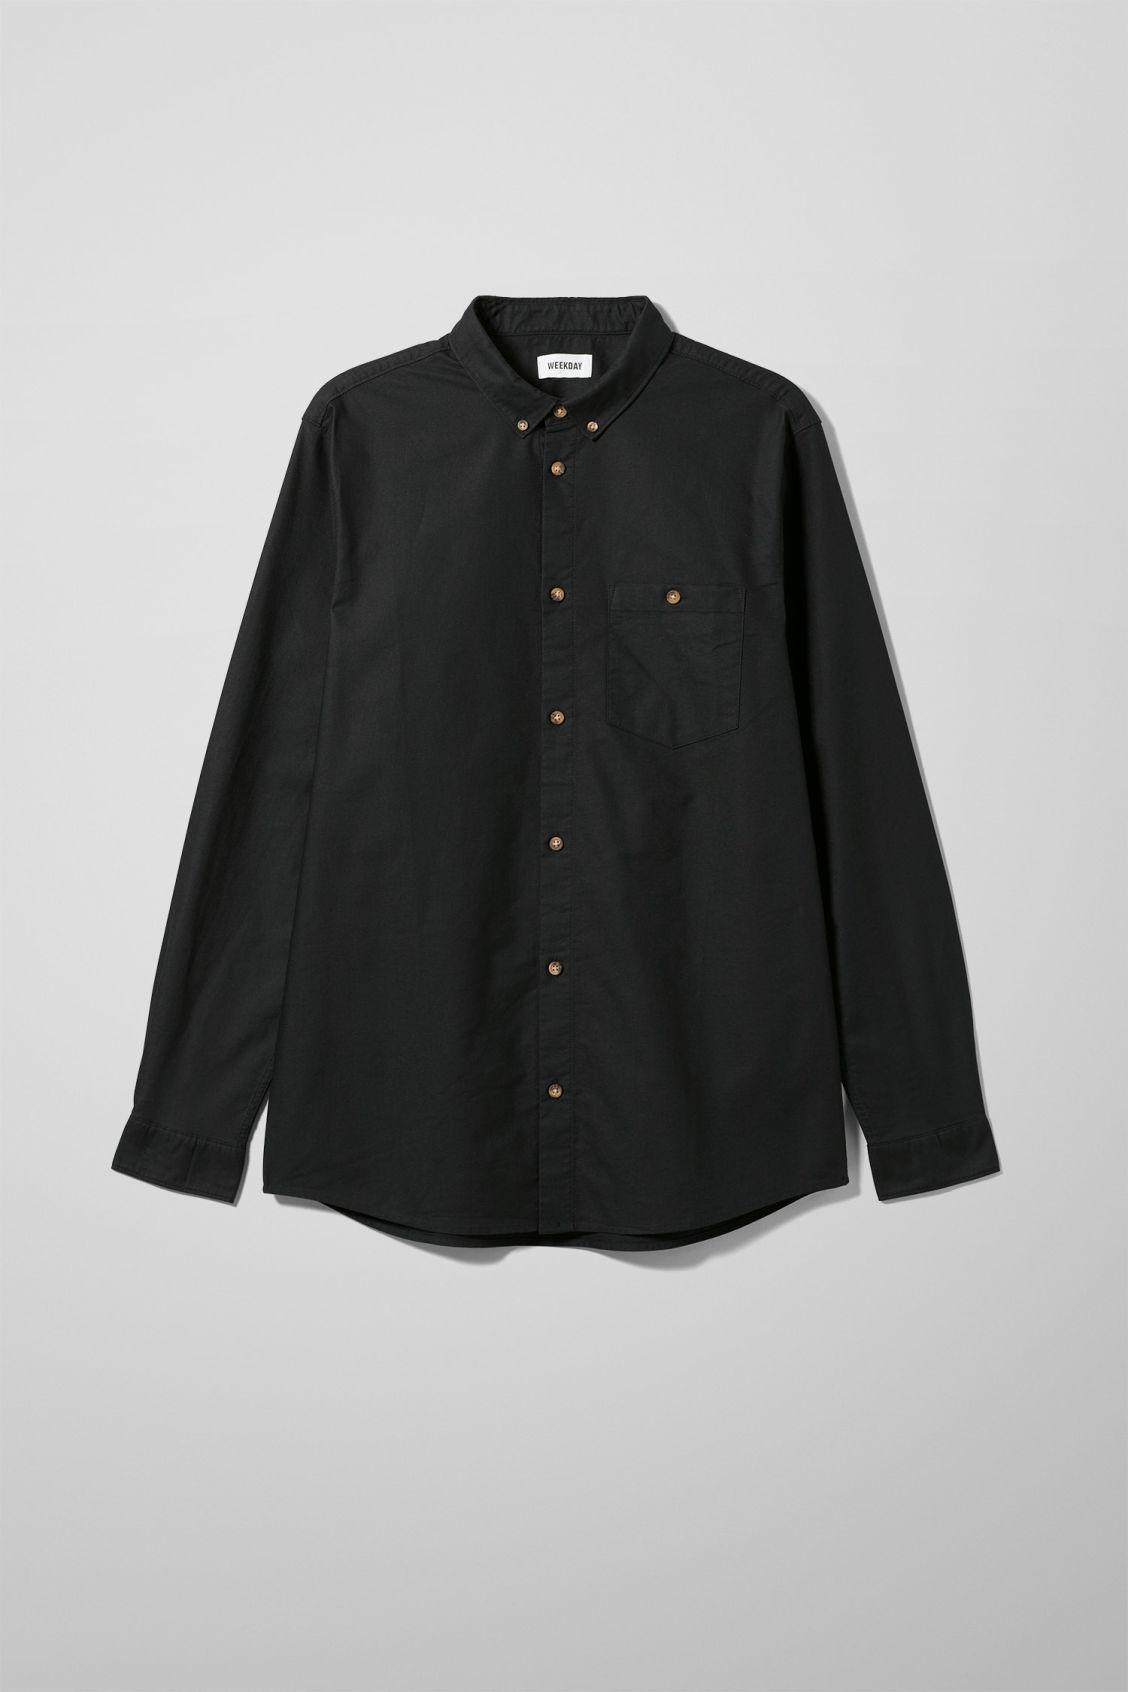 Bad Times Shirt - Black